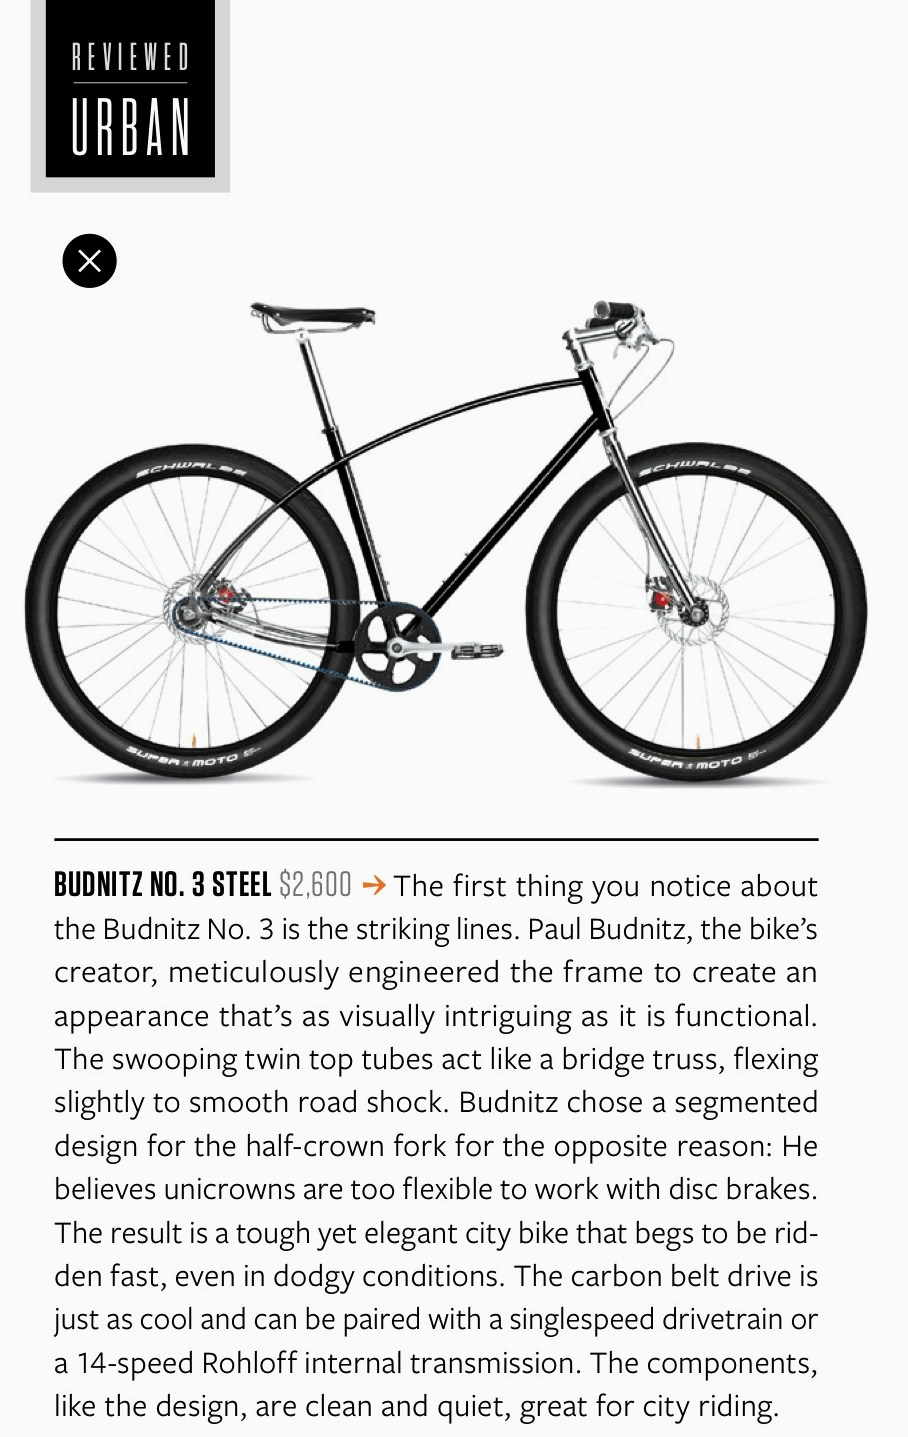 Bicycling Buyers Guide_budnitz No 3 review_April 14 (2)